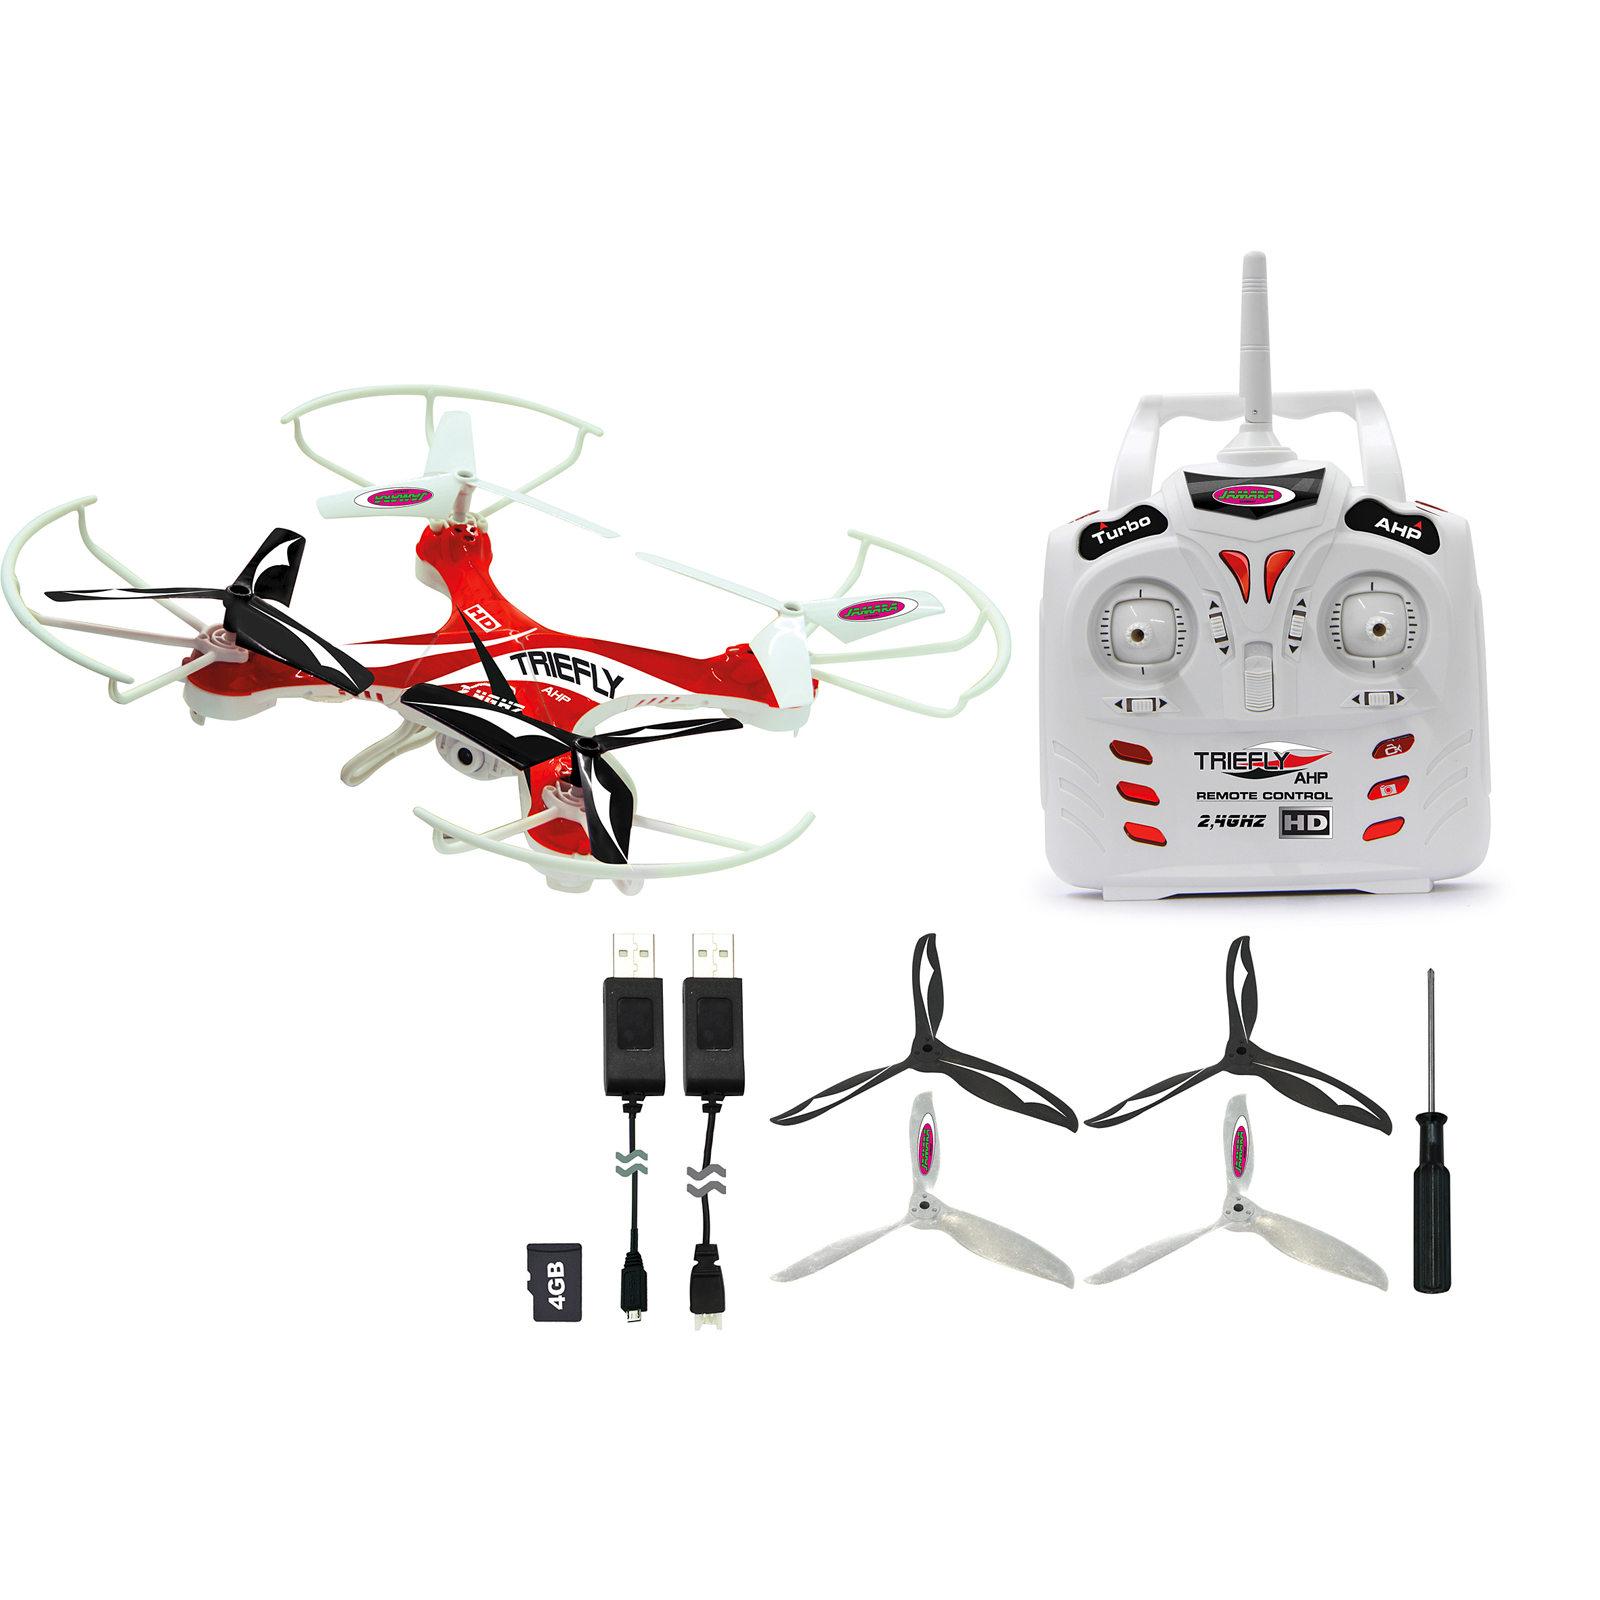 Jamara triefly HD AHP Quadrocopter 422002 4042774429669 | eBay